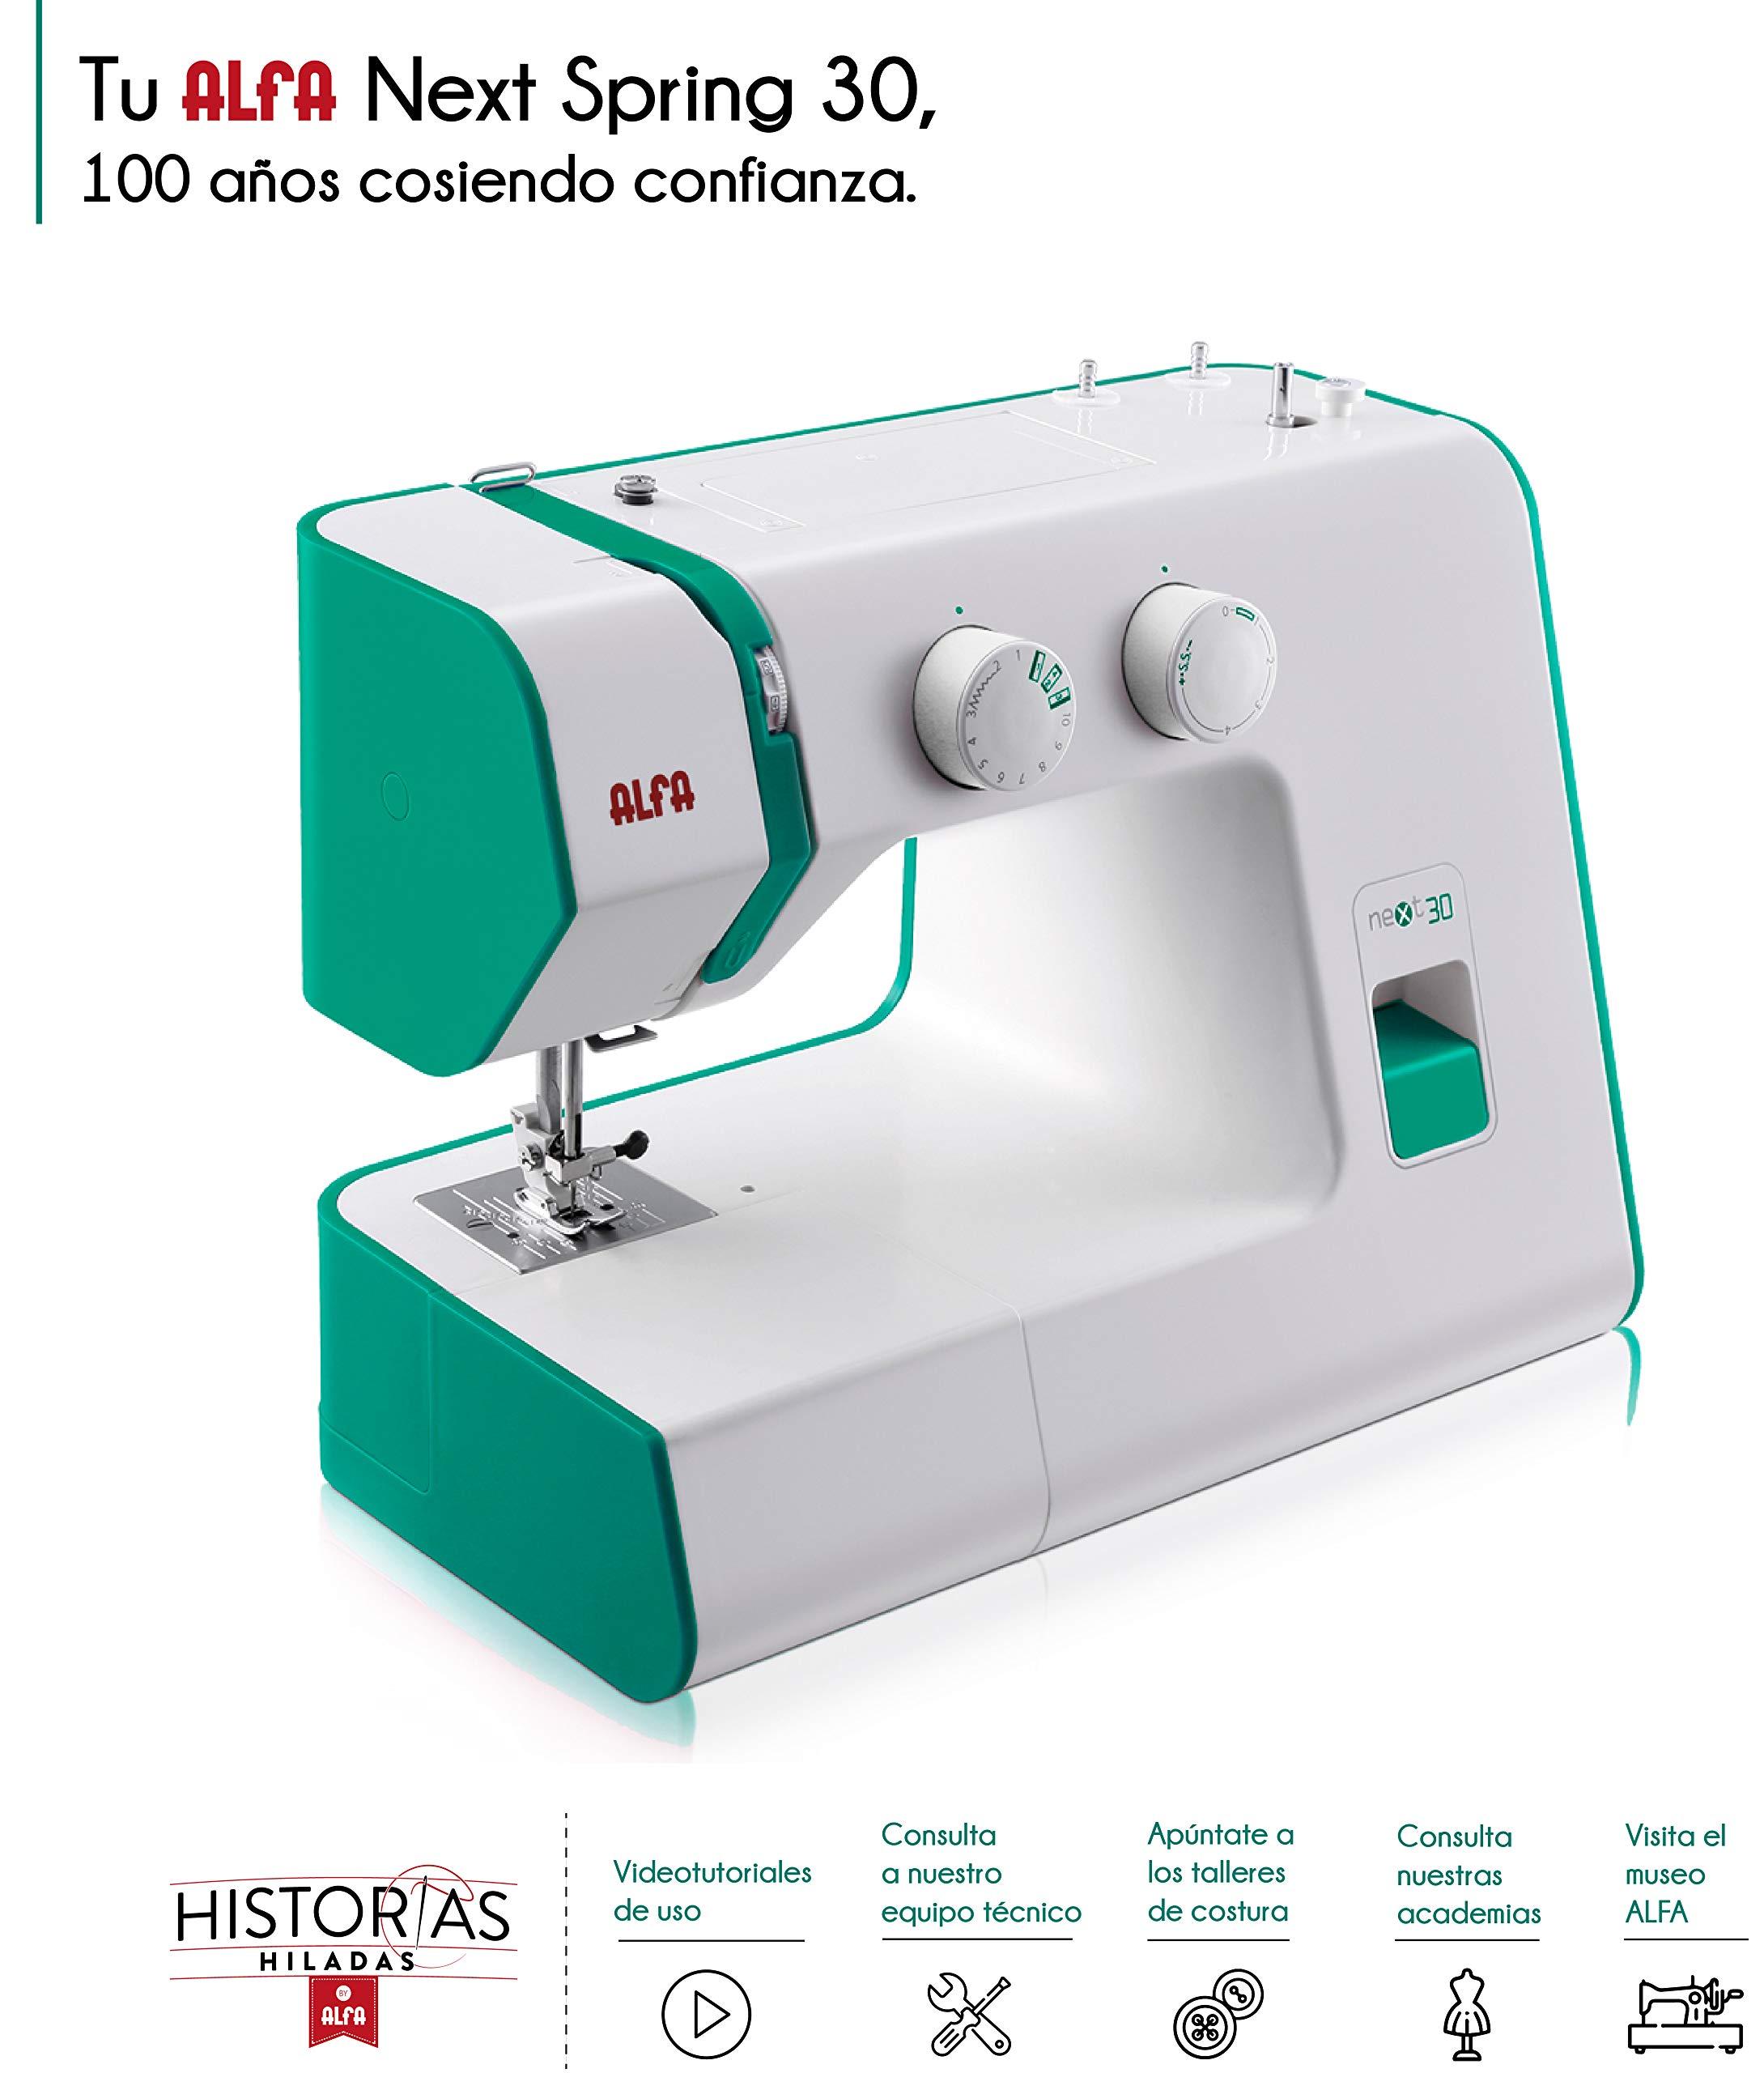 Alfa Hogar Maquina De Coser Next 30 Spring Zig-Zag.Domestica, Verde Esmeralda, 30 X 19 X 37 Cm